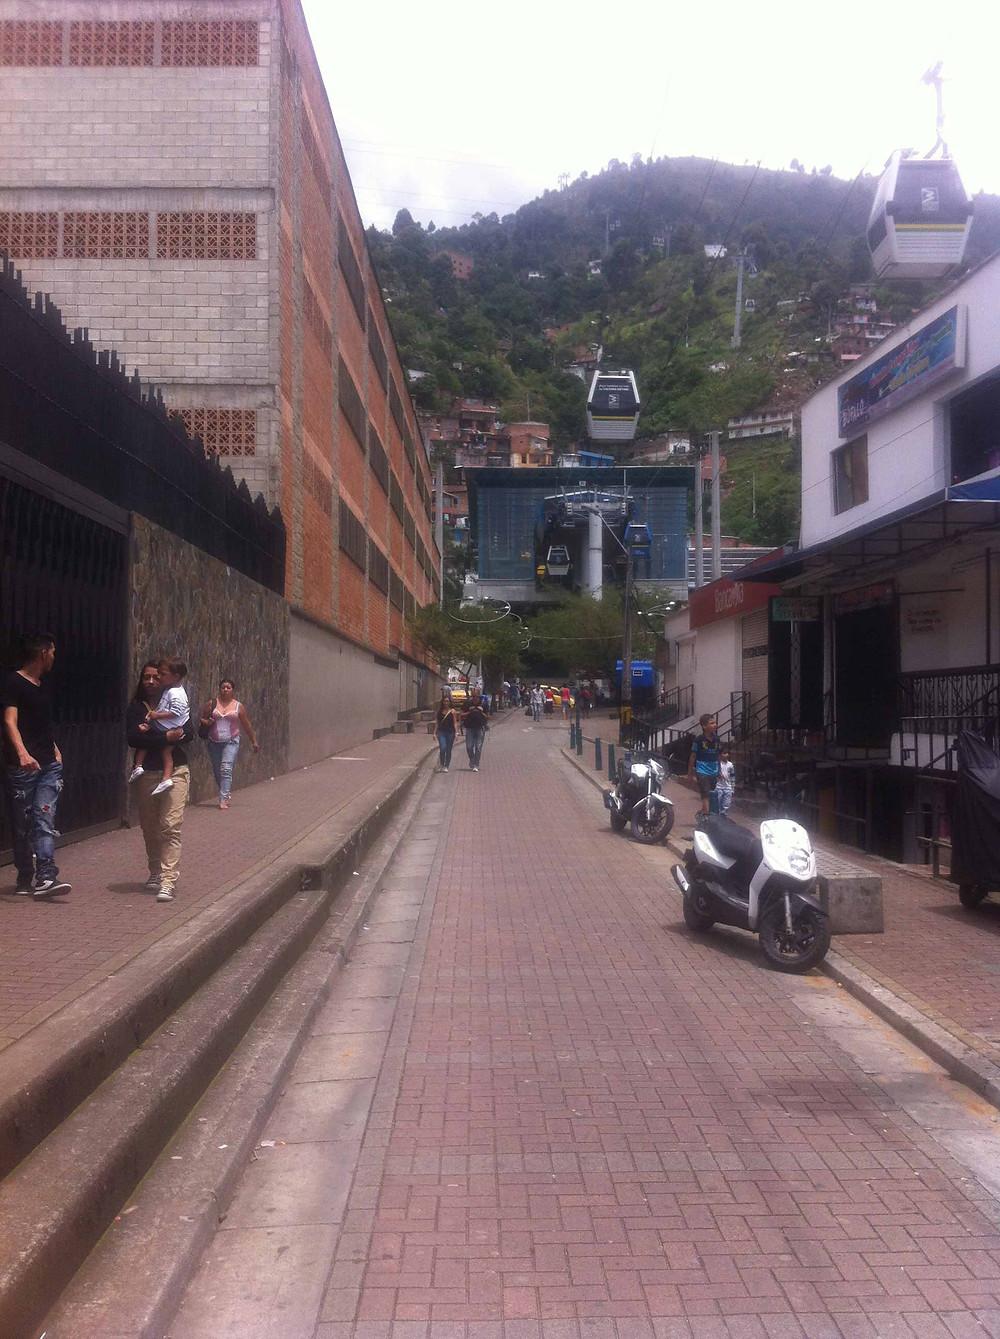 Rua de pedestres - Comunidade Santo Domingo